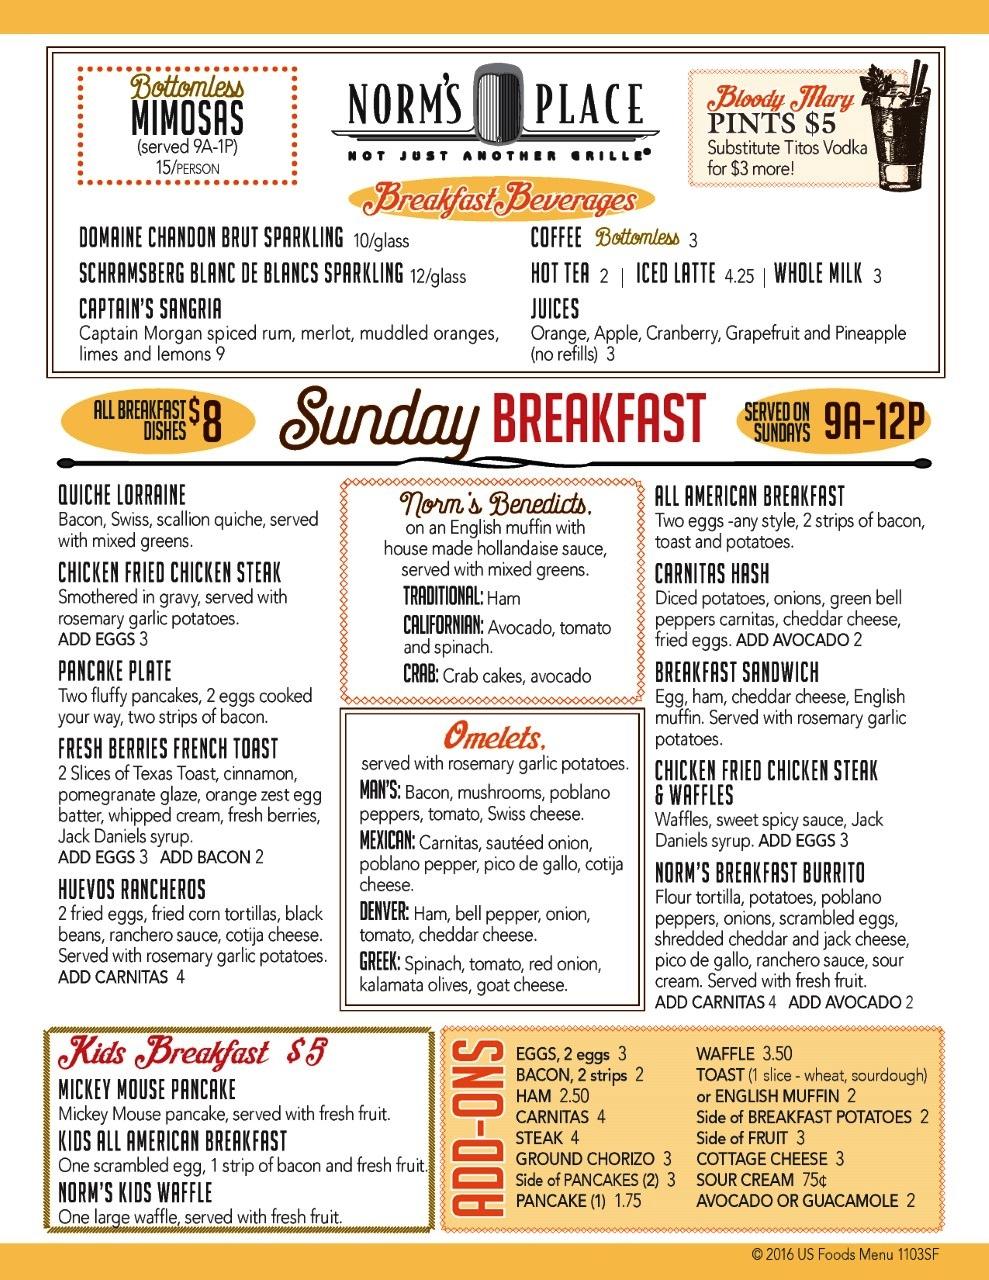 Norm's Place Danville Breakfast